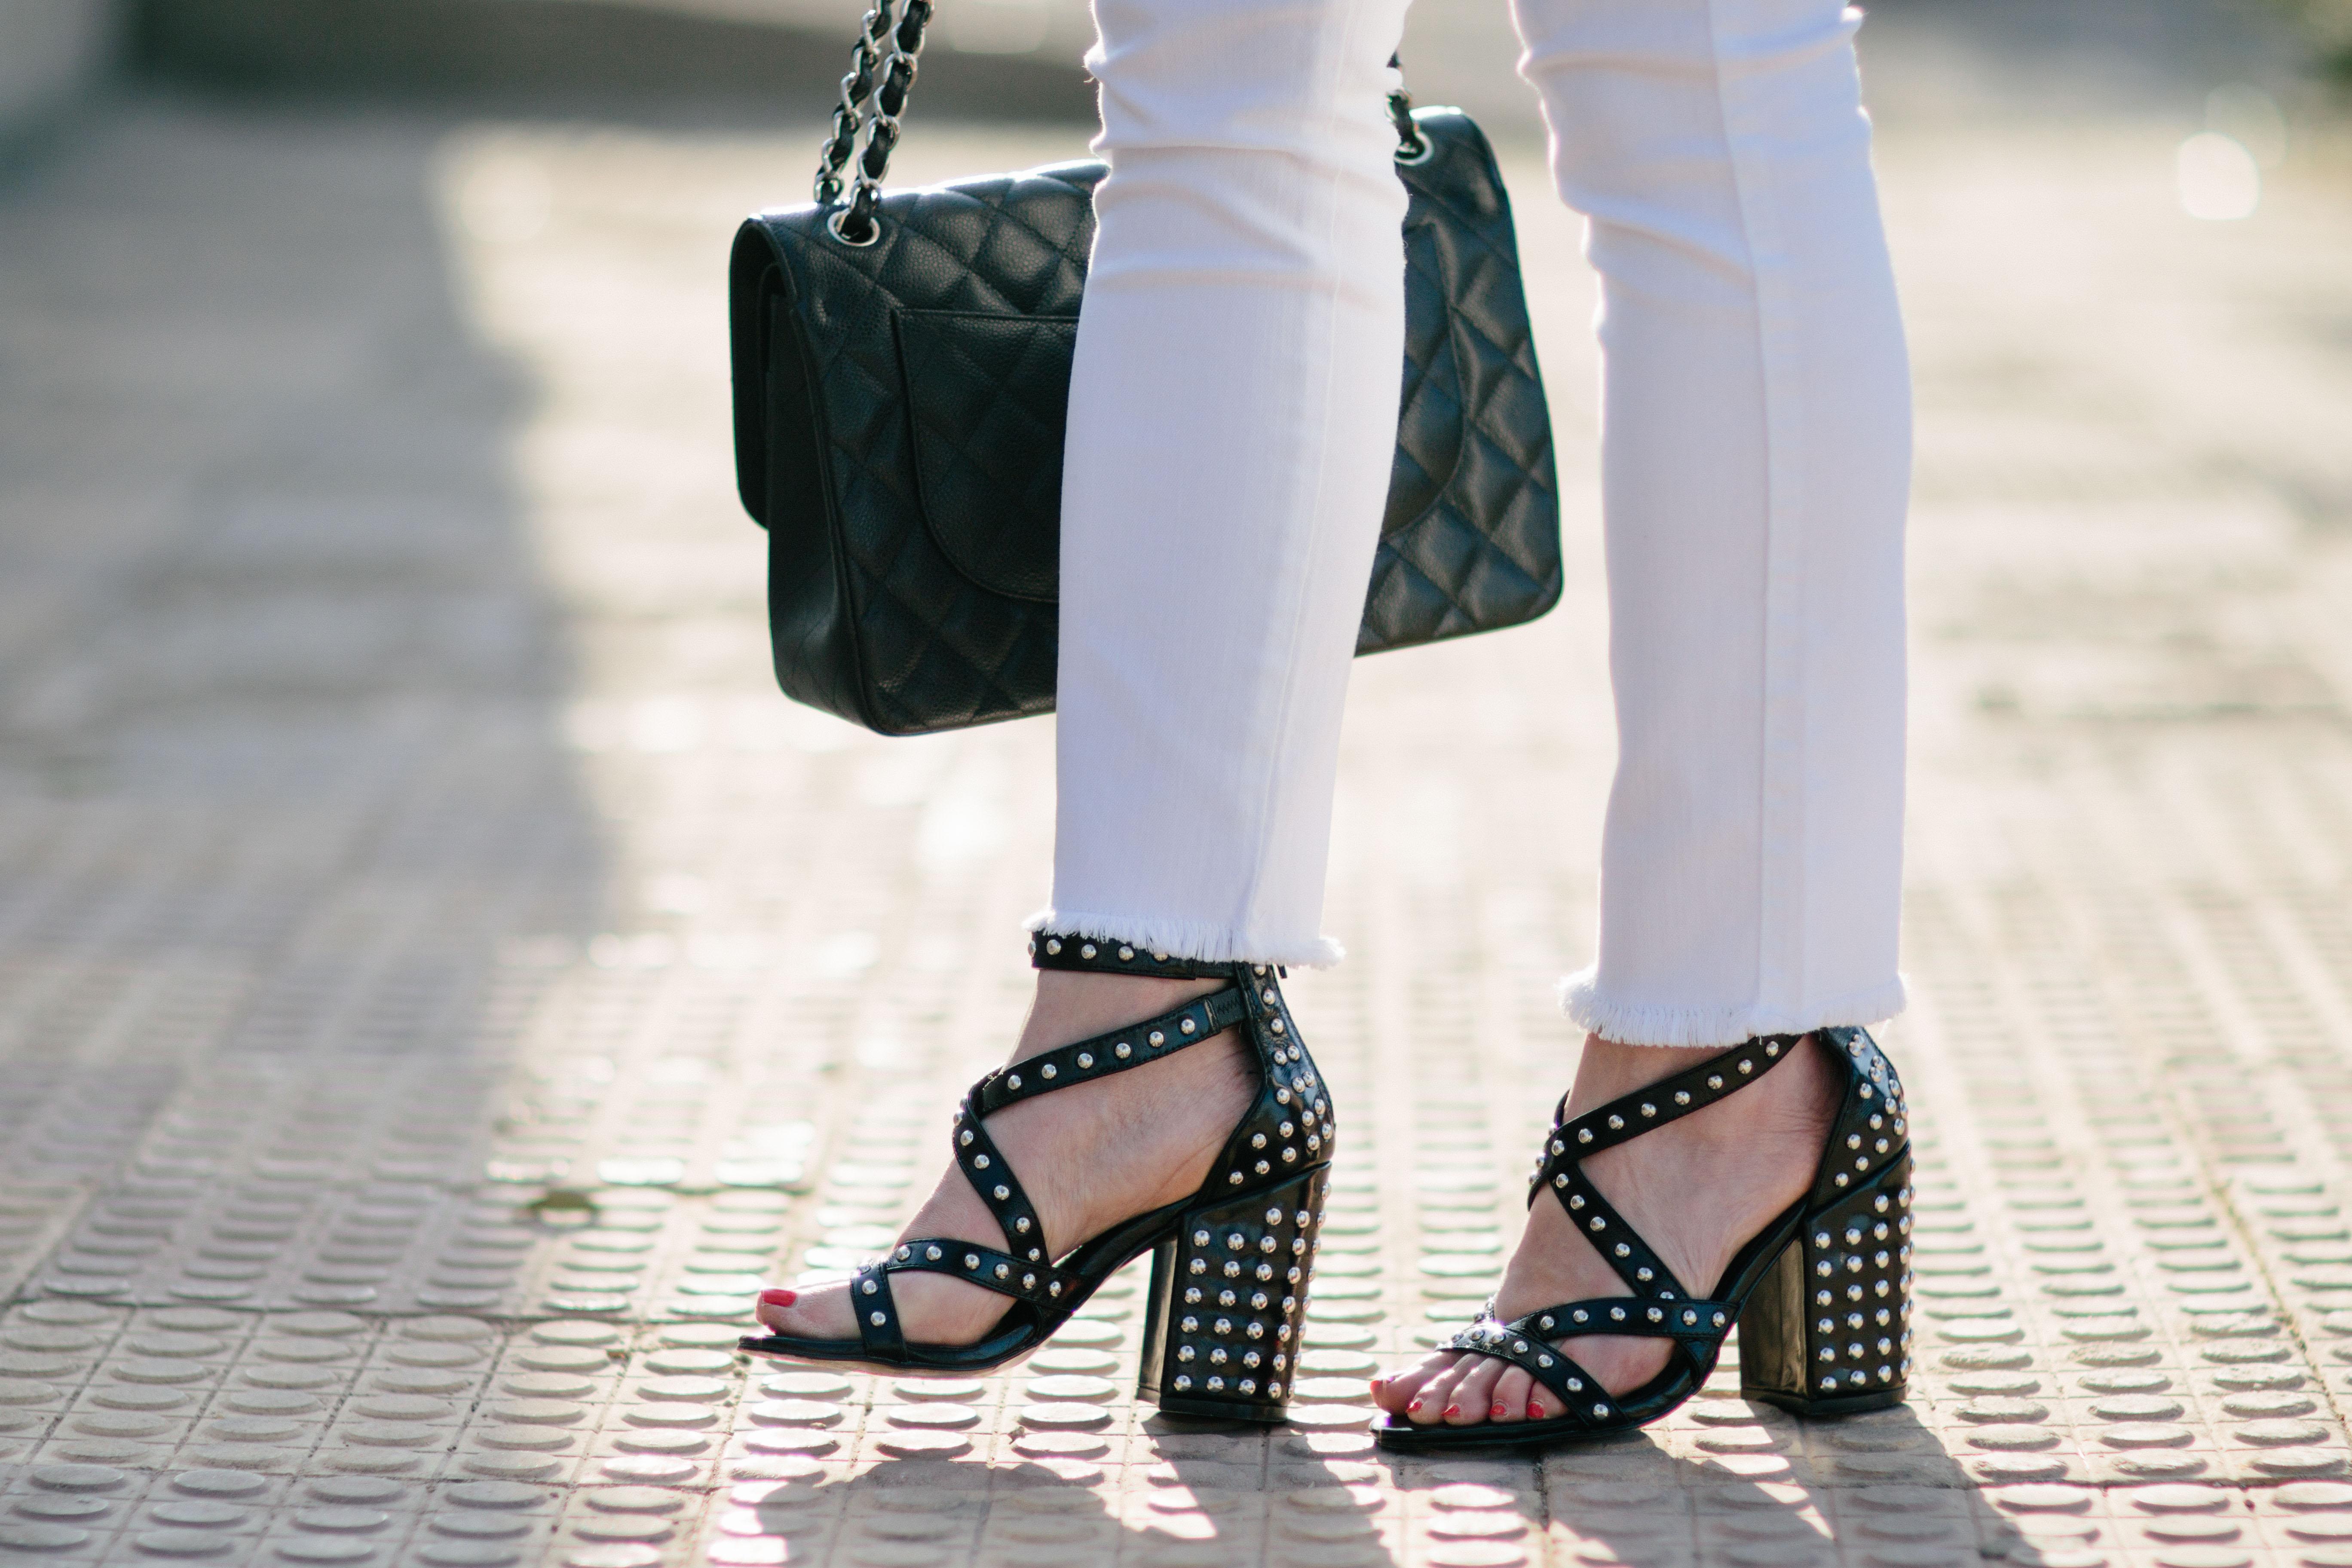 2a903fd13da Steve Madden Fara S studded black leather block heel sandals ...